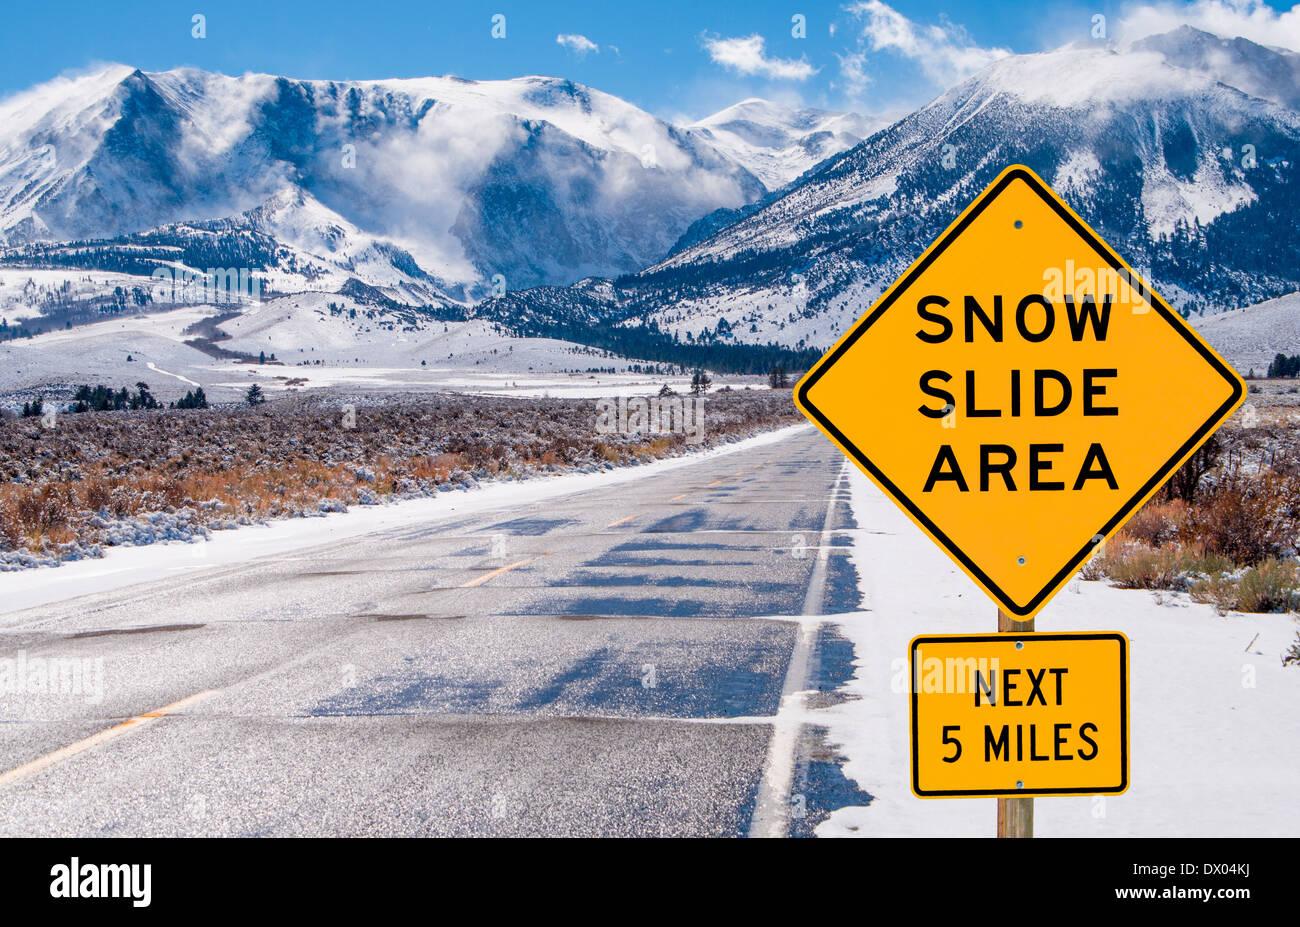 Snow Slide Area Sign - Stock Image